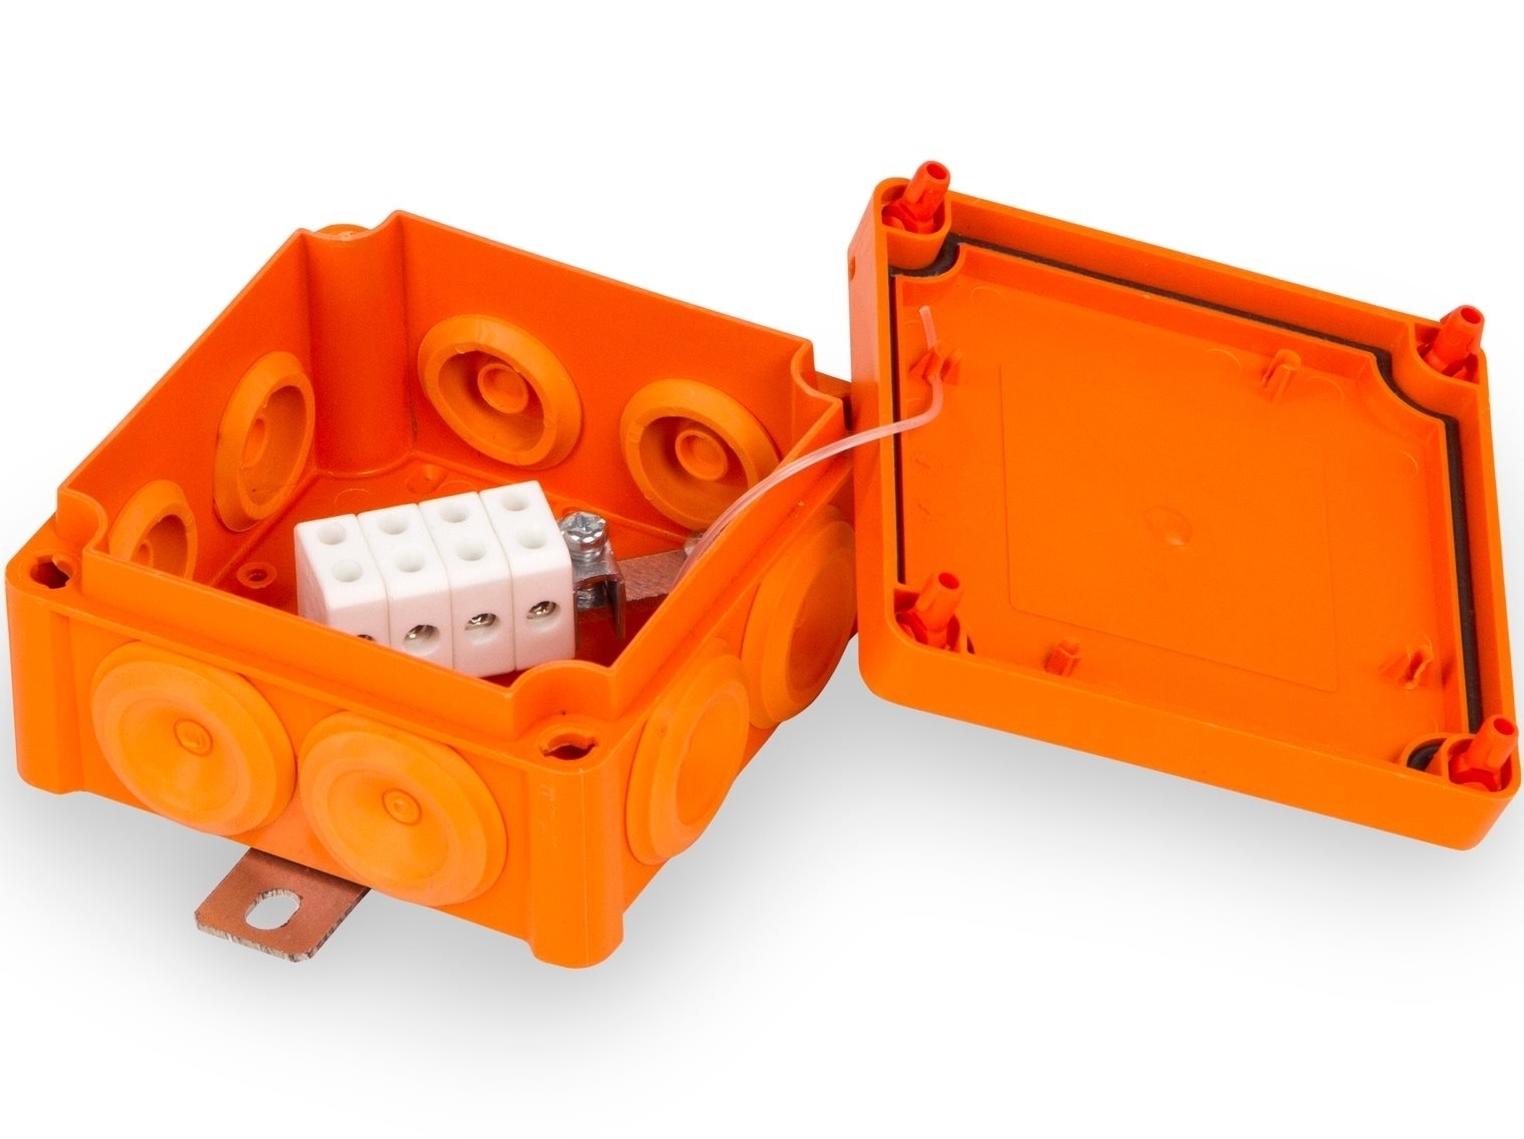 Tulekindel harukarp 100x100x53,5 mm, FPT1010PP46, Ensto Vulcano, E30-90